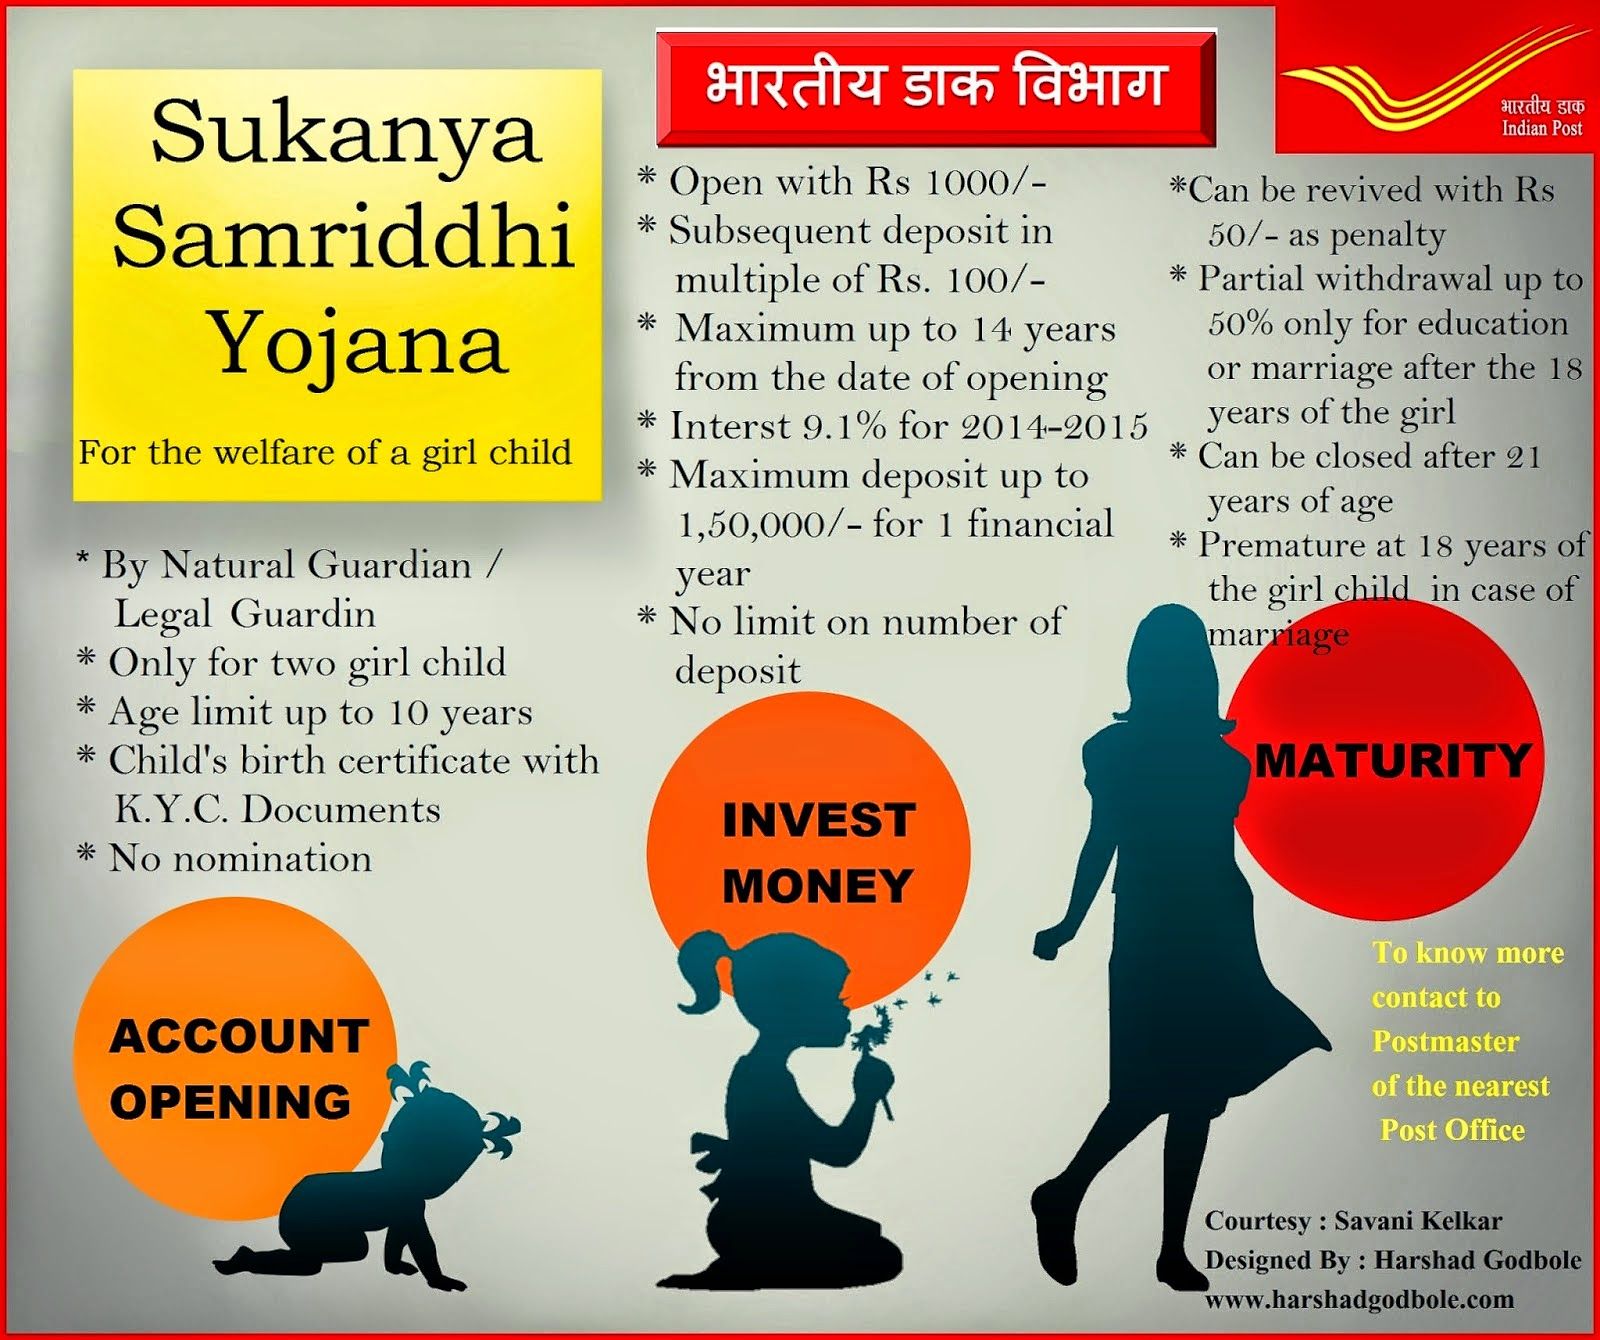 System administrators indiapost sukanya samriddhi account yojana highest fetching - Post office account for benefits ...